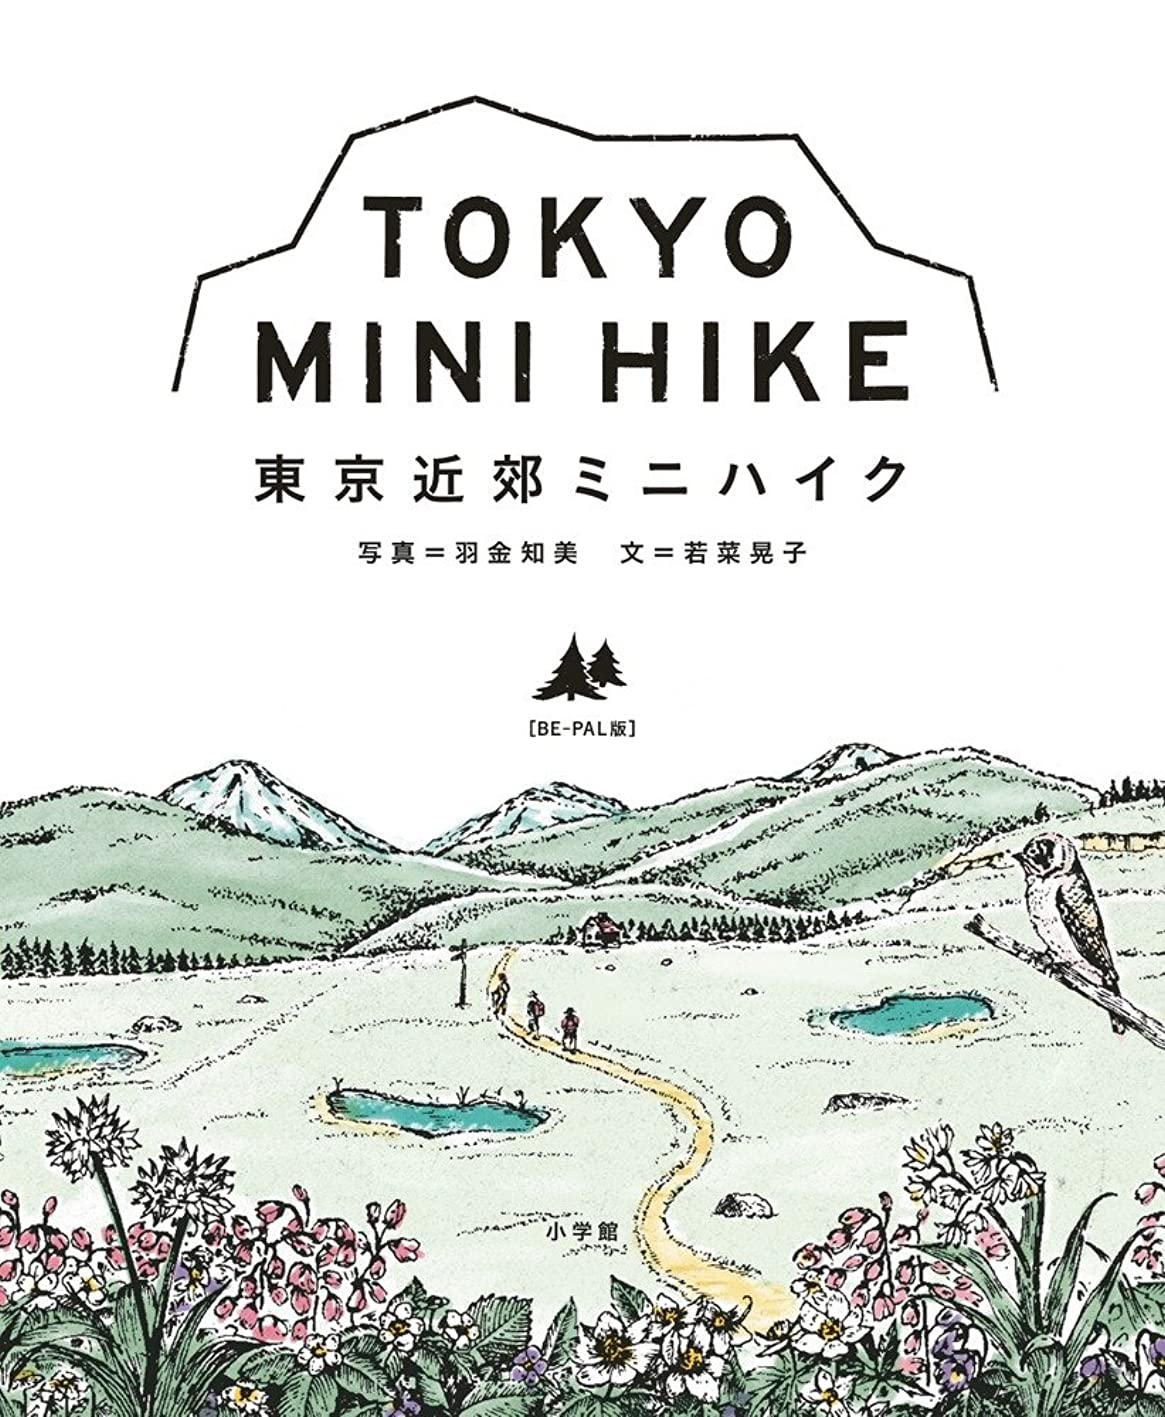 水平支援肌東京近郊ミニハイク〔BE-PAL版〕: TOKYO MINI HIKE (実用単行本)